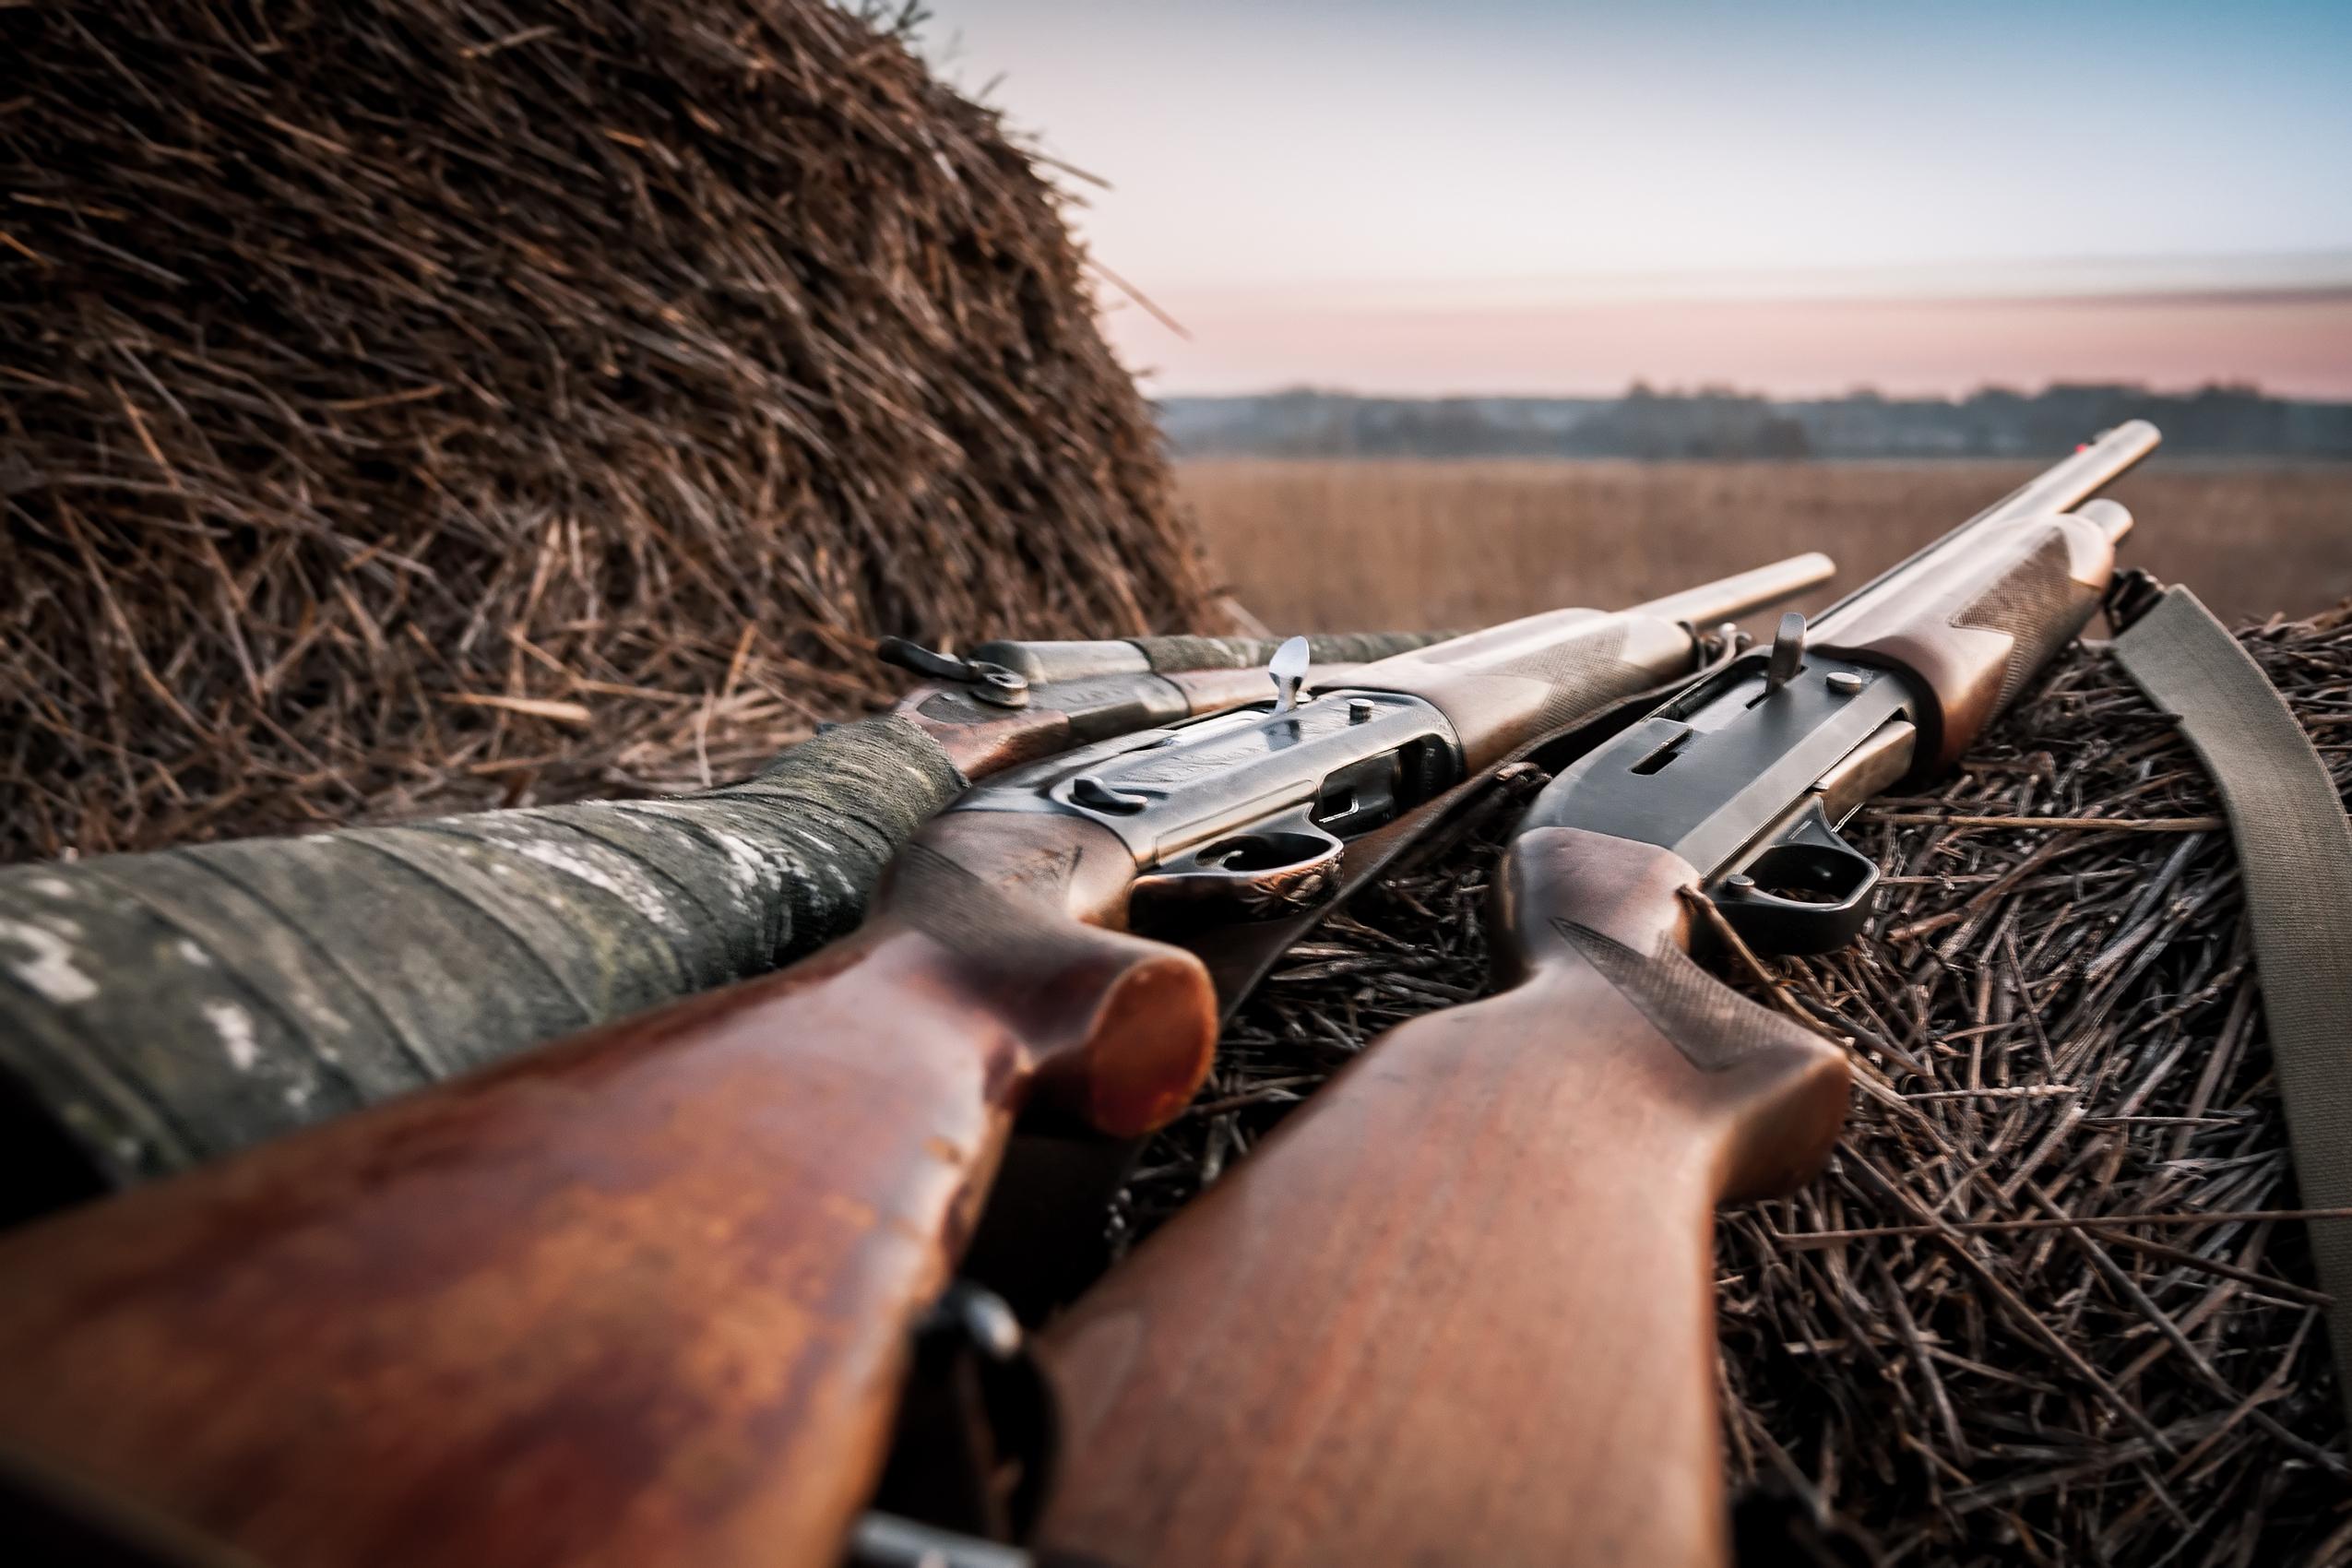 Three rifles sitting on hay bales.